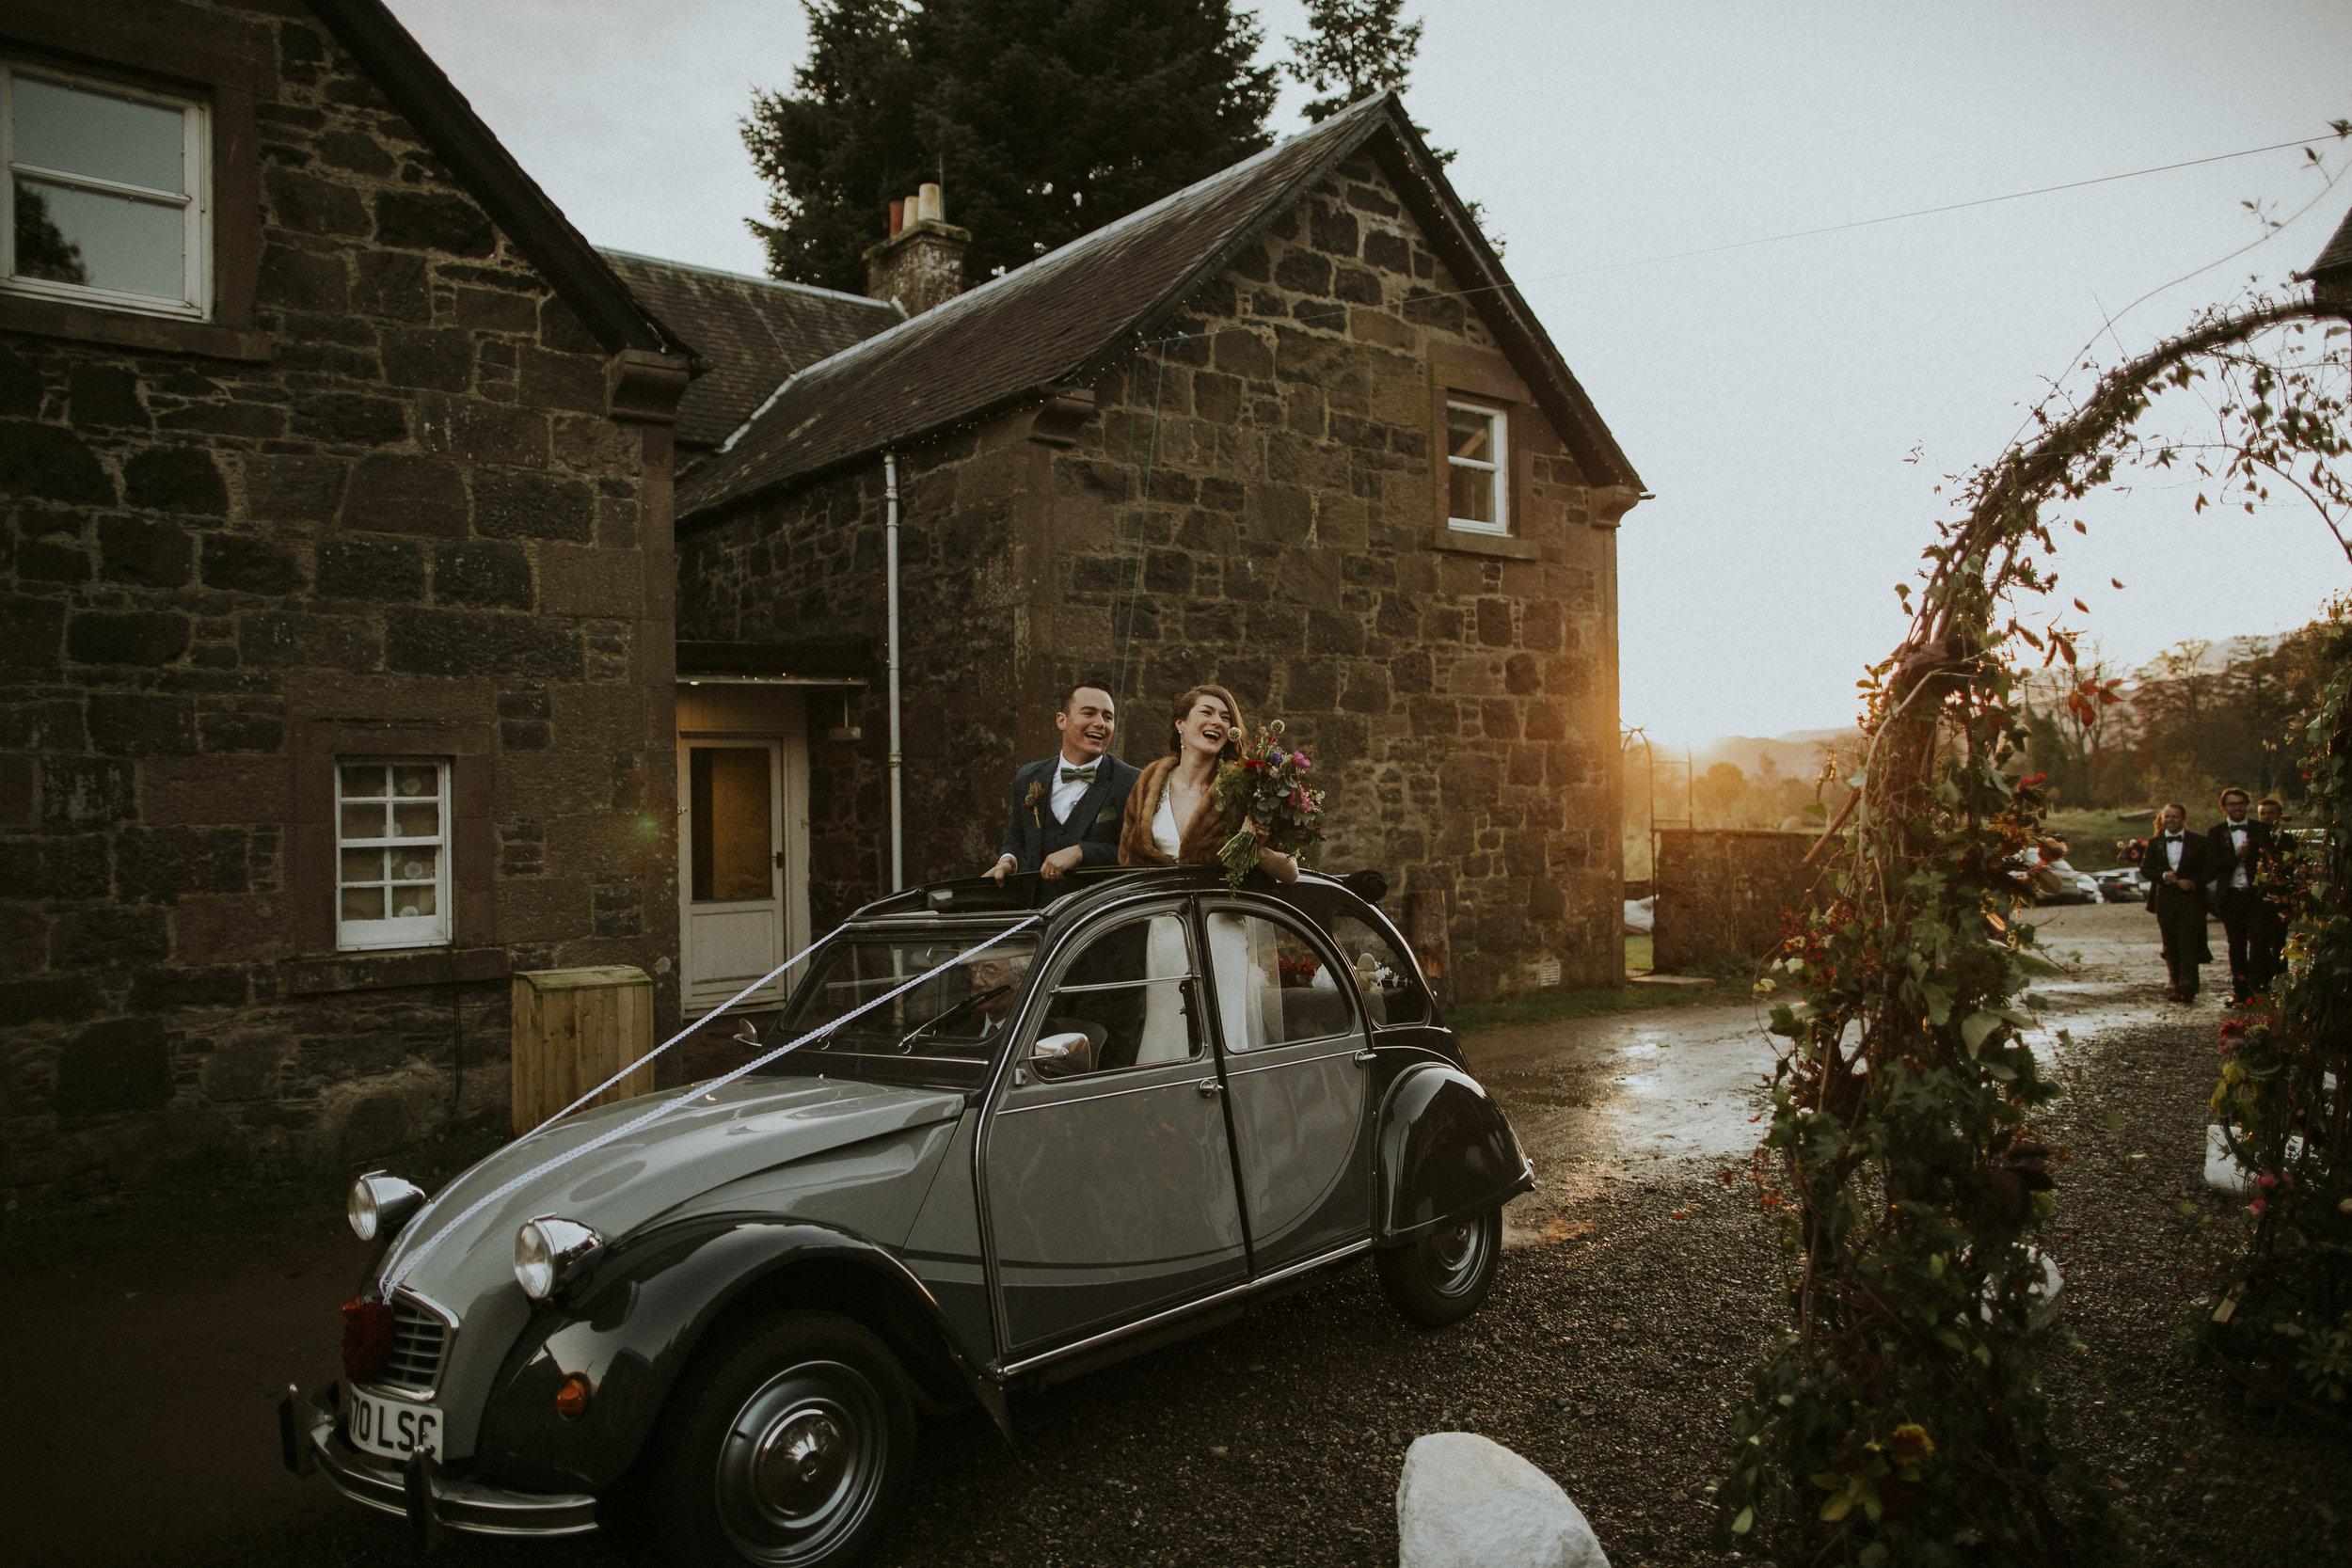 458_golden_hour_wedding_scotland.jpg